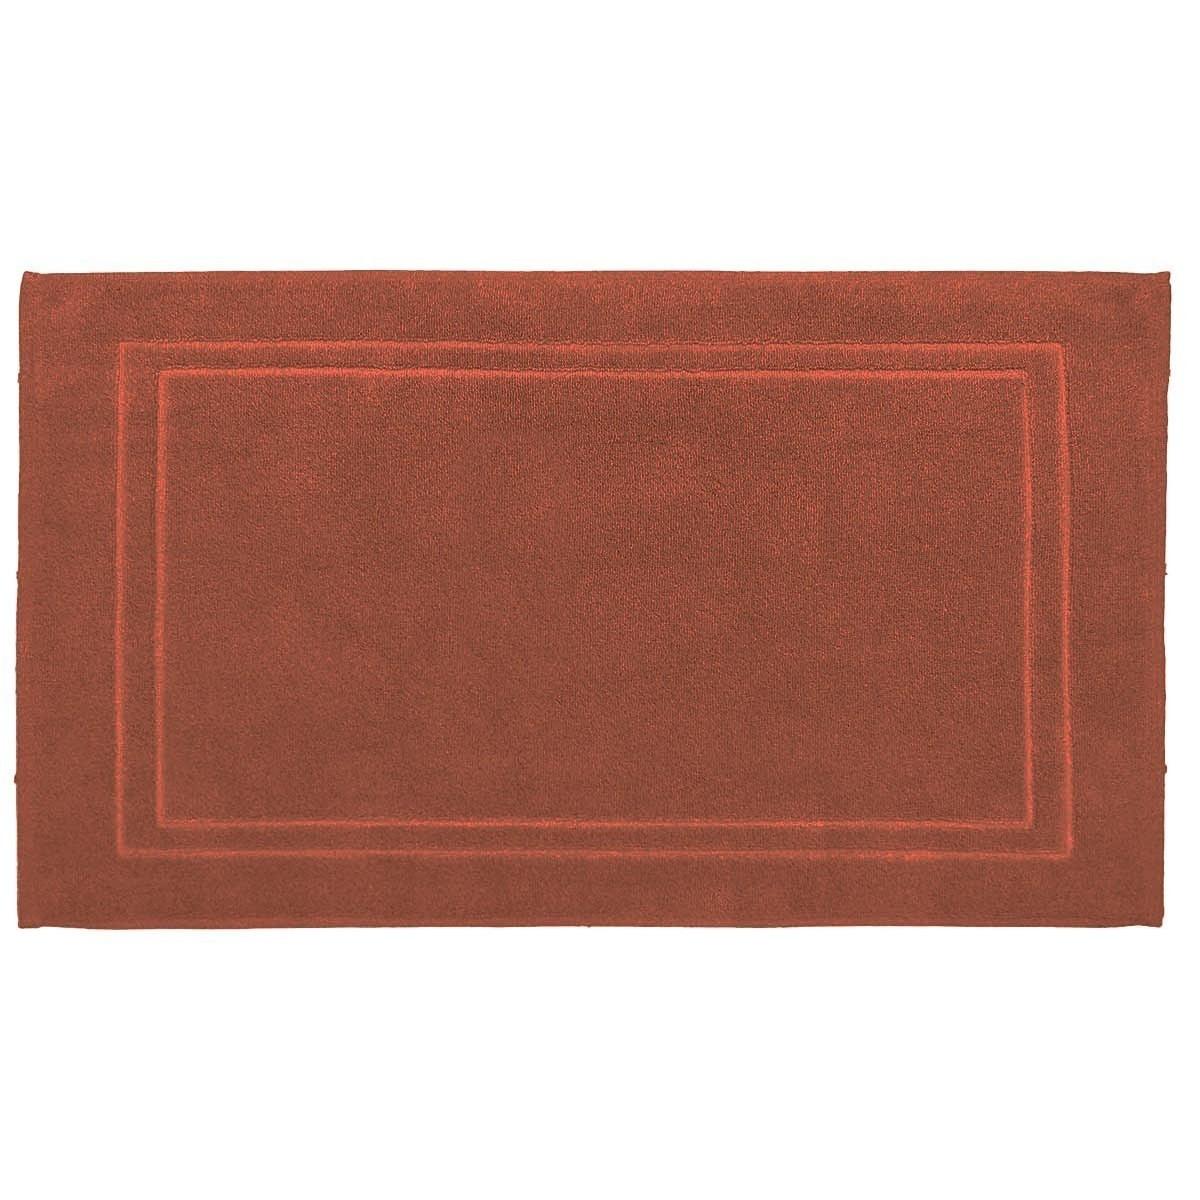 Tapis de bain 900gr/m²  Terracota 50x80 cm